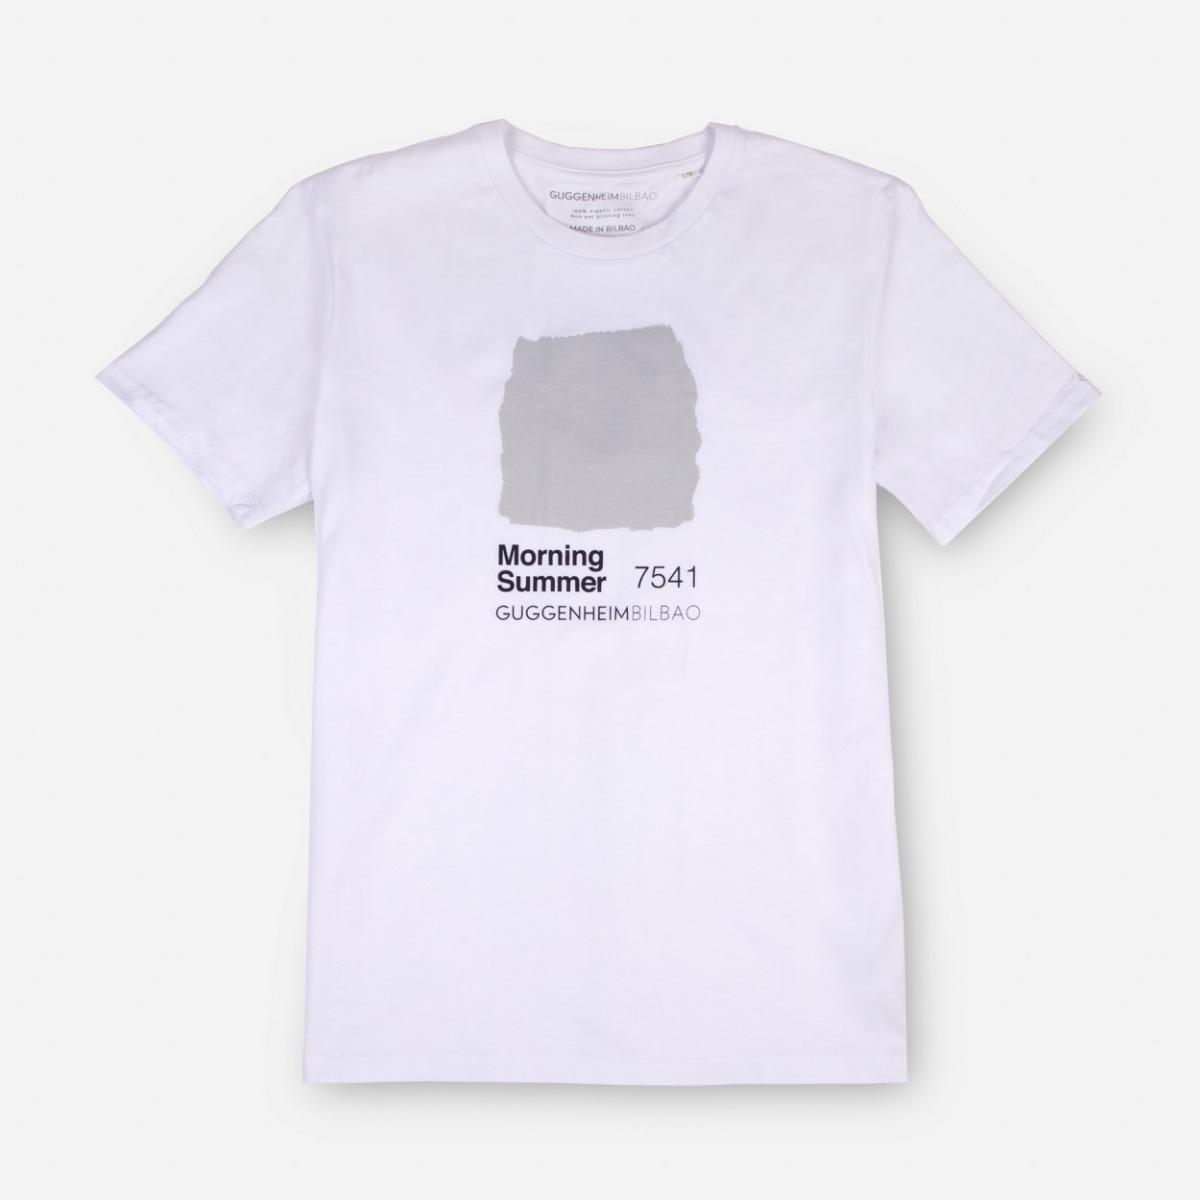 Camiseta Morning Summer 07:35